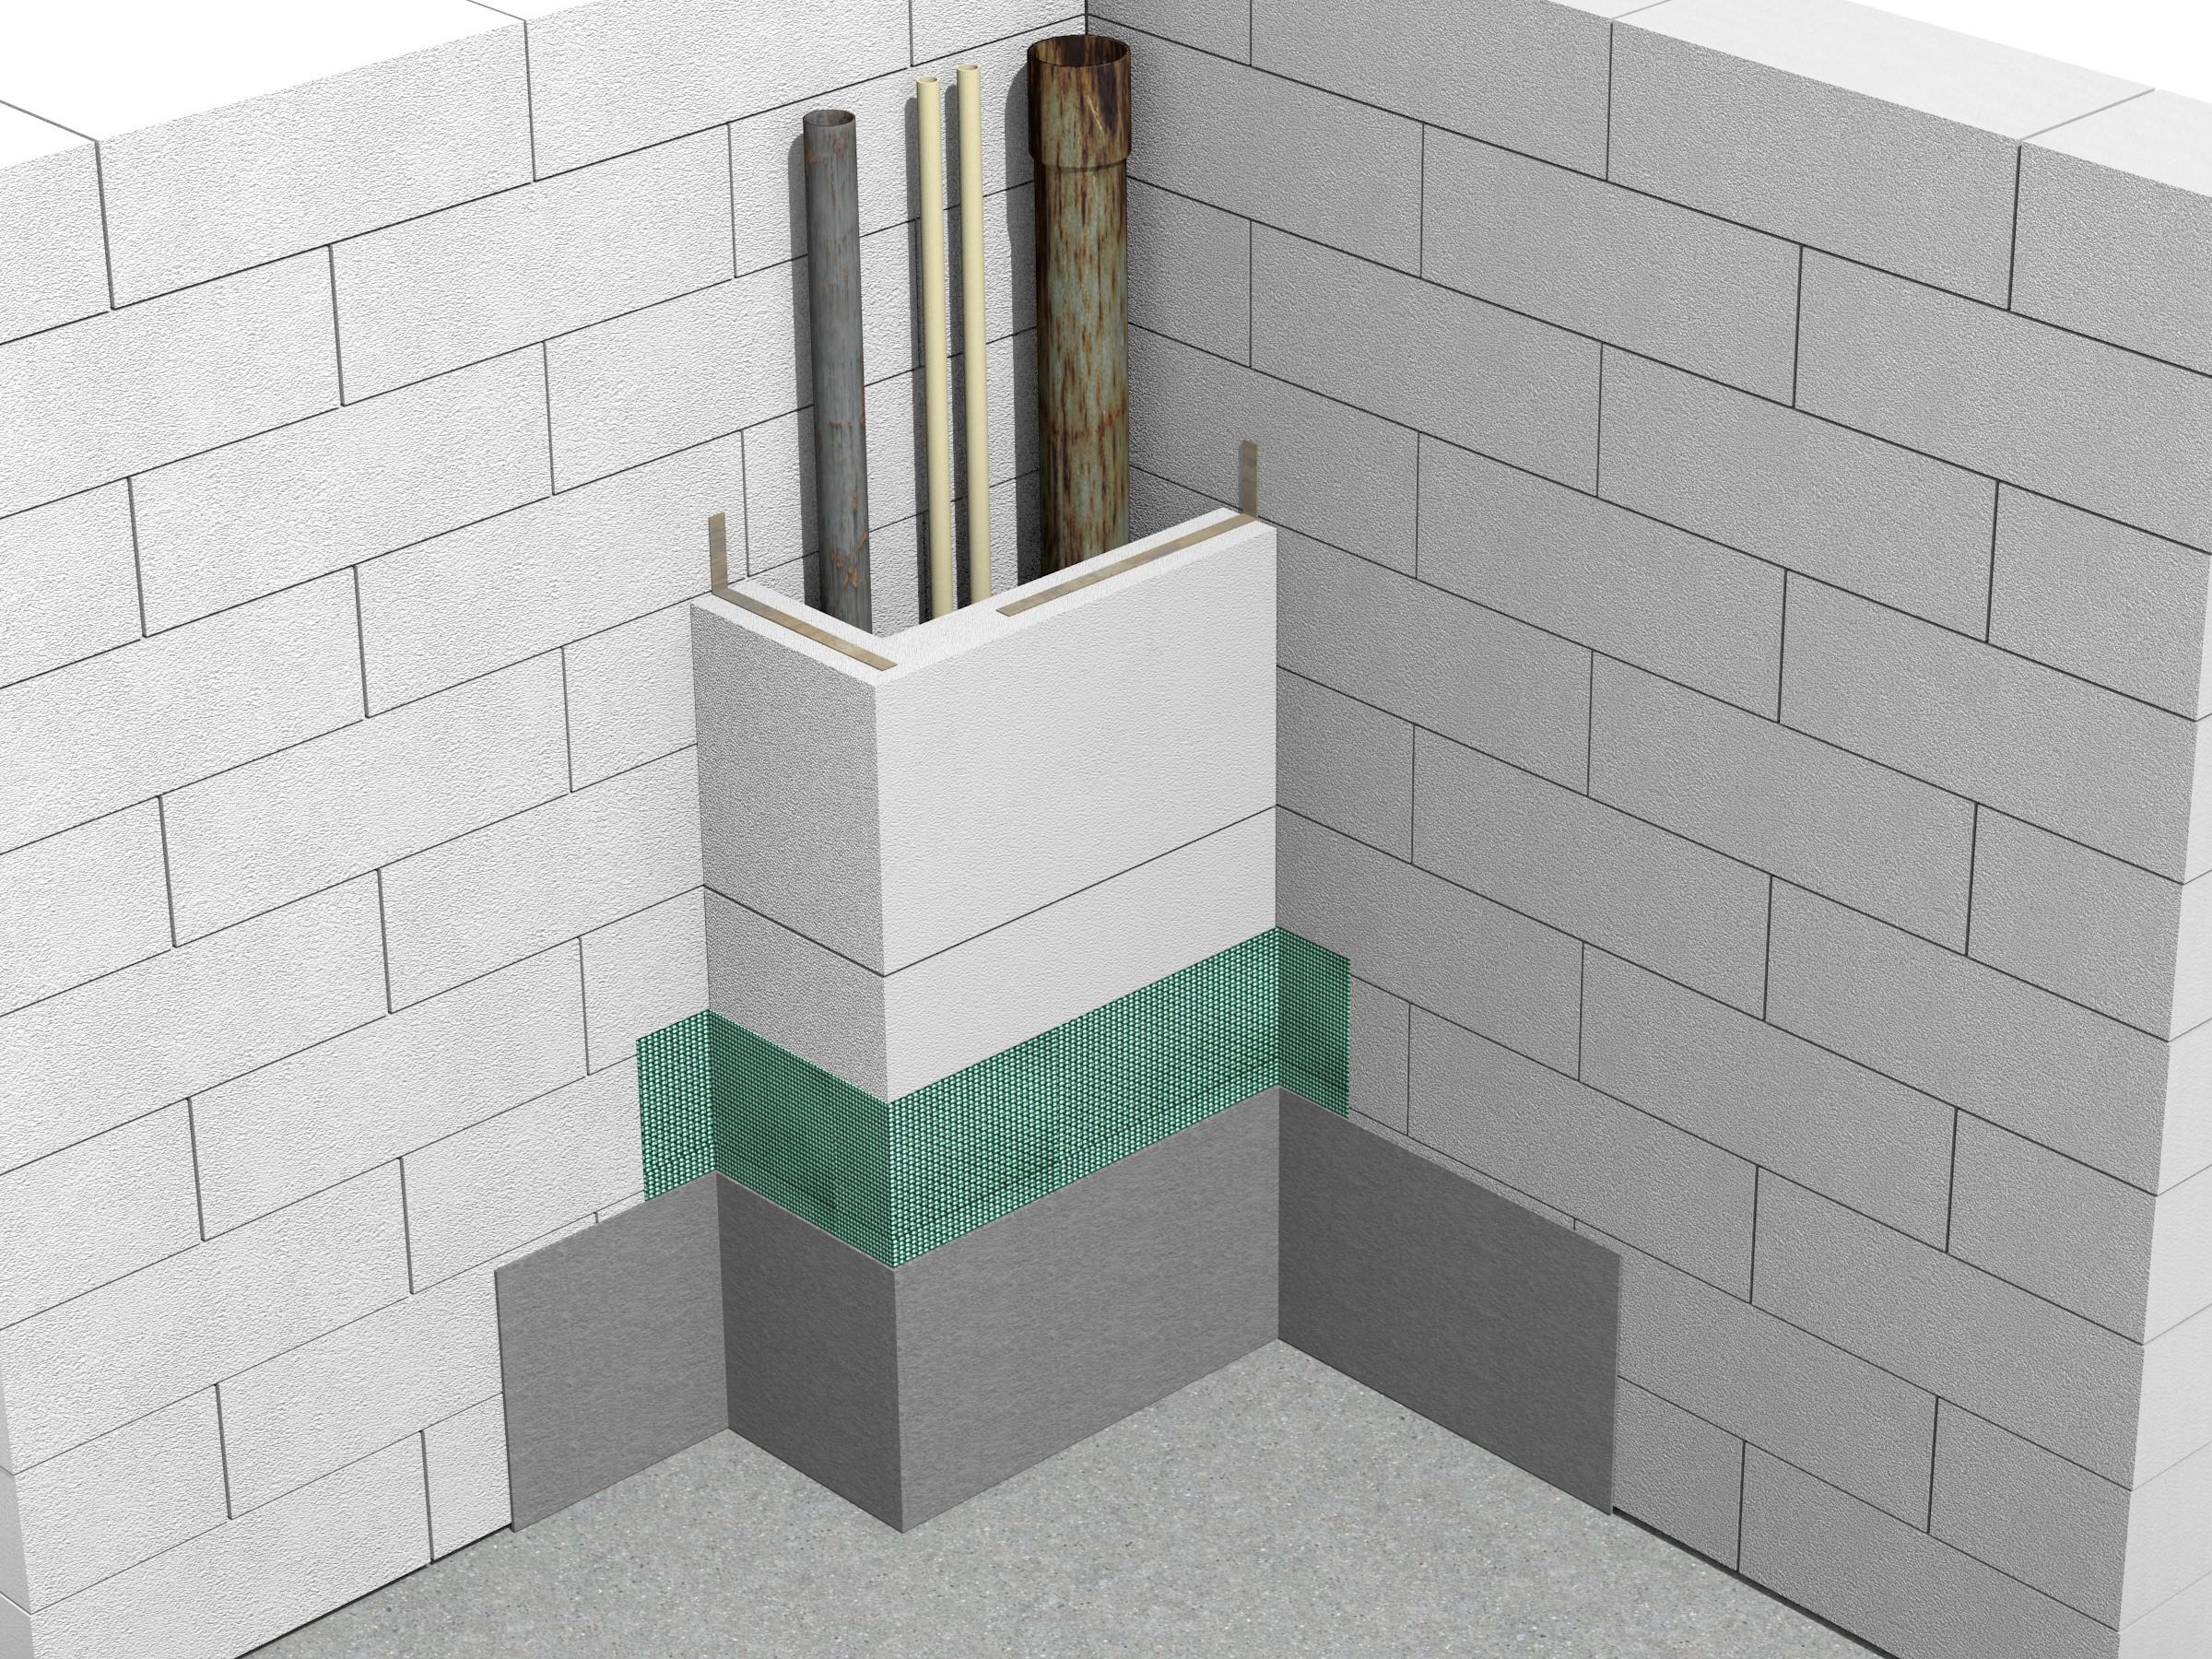 Detaliu ghena de instalatii cu profile BL - Alte constructii din zidarie Ytong